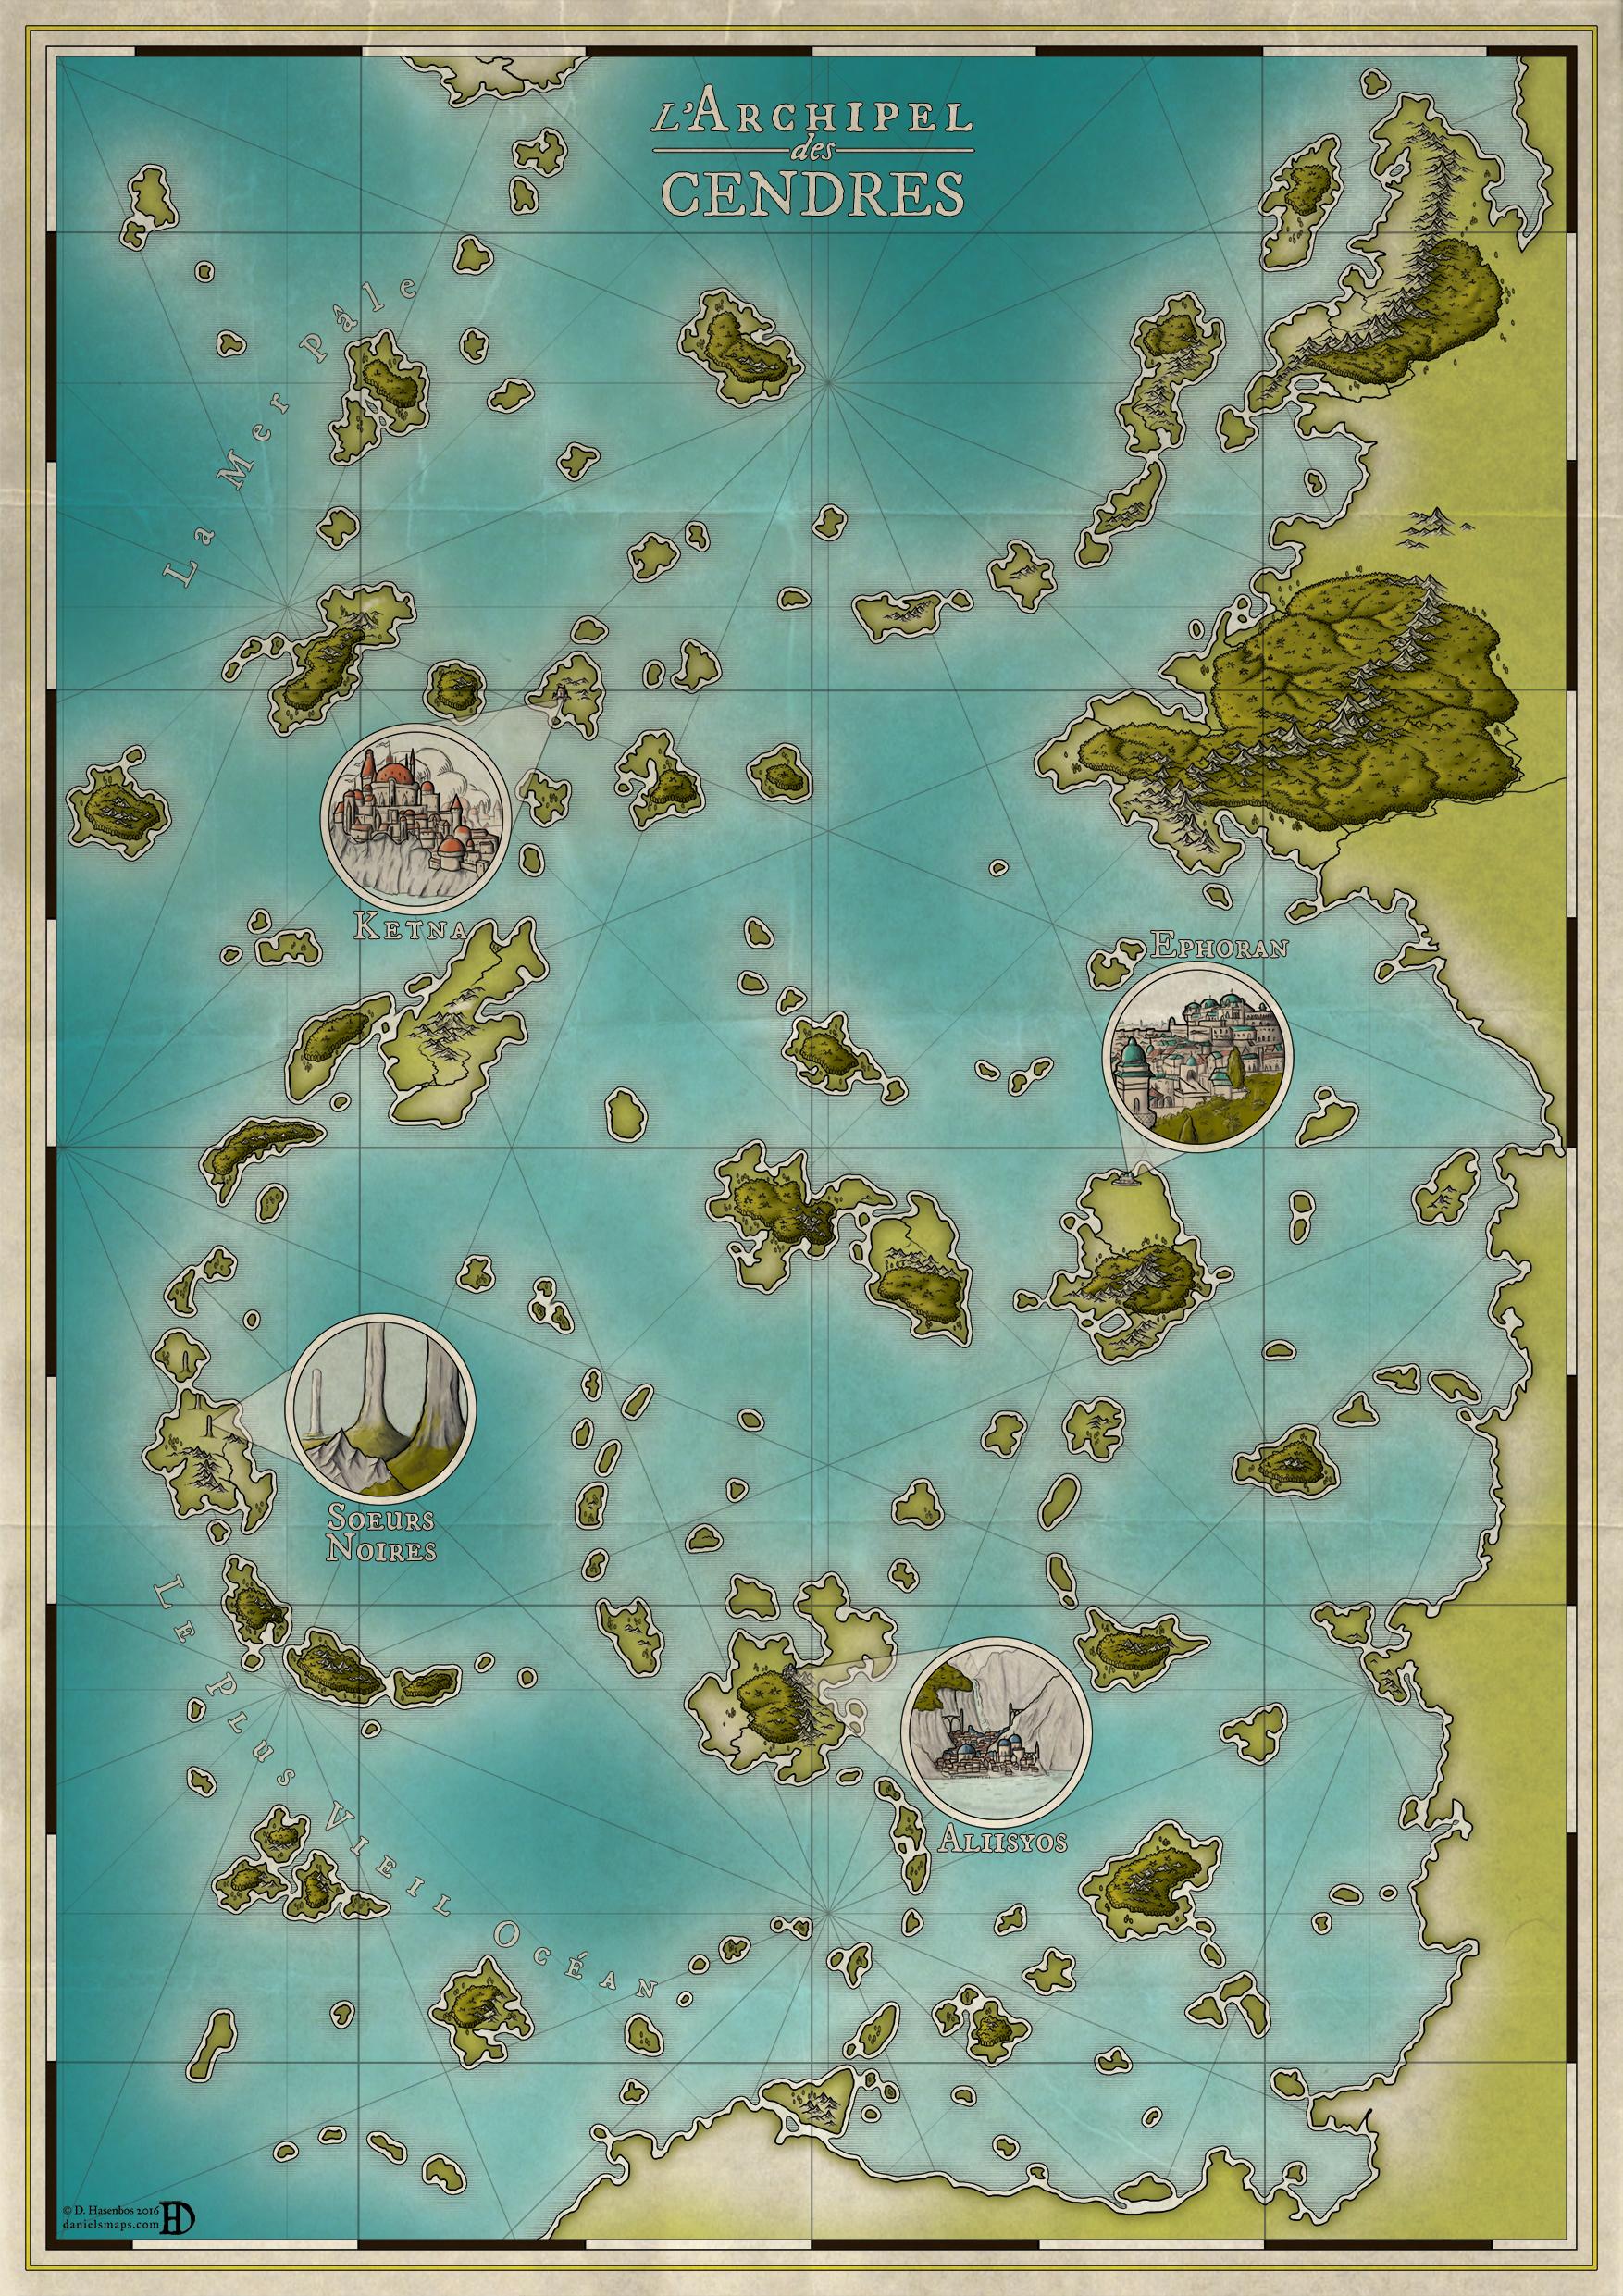 Archipelago of Ashes by DanielHasenbos